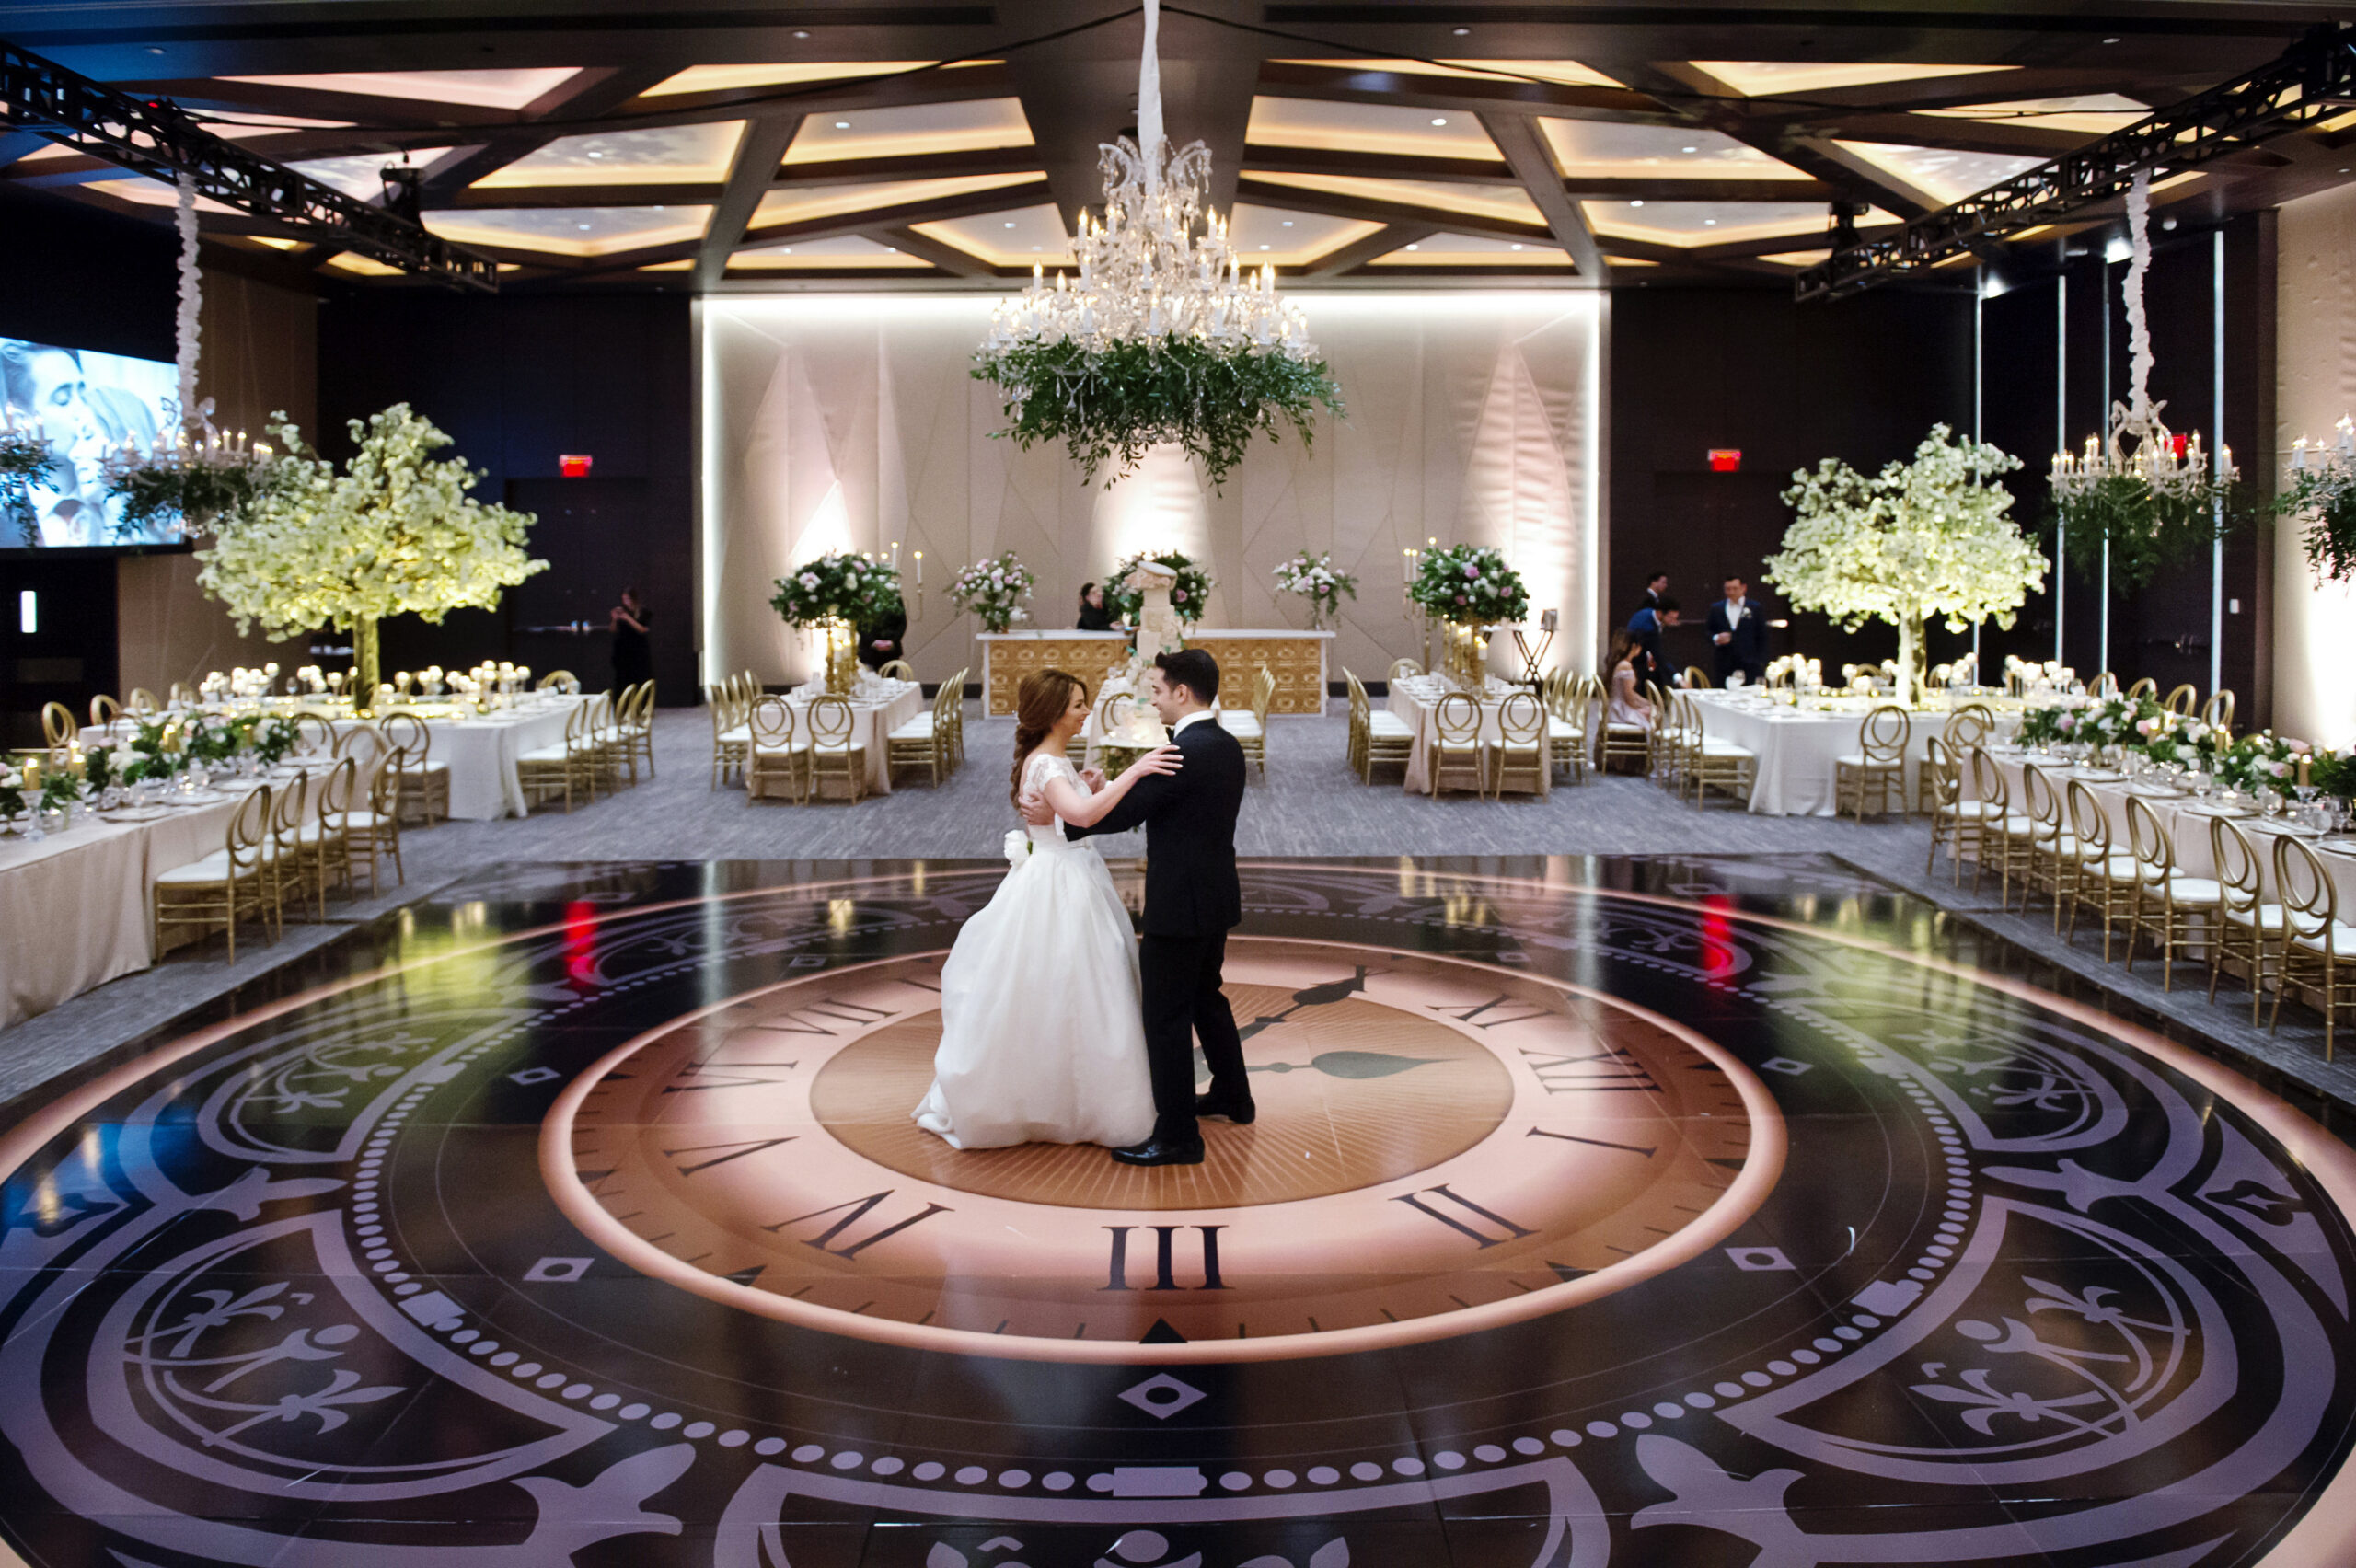 https://secureservercdn.net/45.40.145.151/kgq.ab5.myftpupload.com/wp-content/uploads/2020/04/Sanam-Soroush-s-Wedding-wedluxe-submission-0102-scaled.jpg?time=1620980216